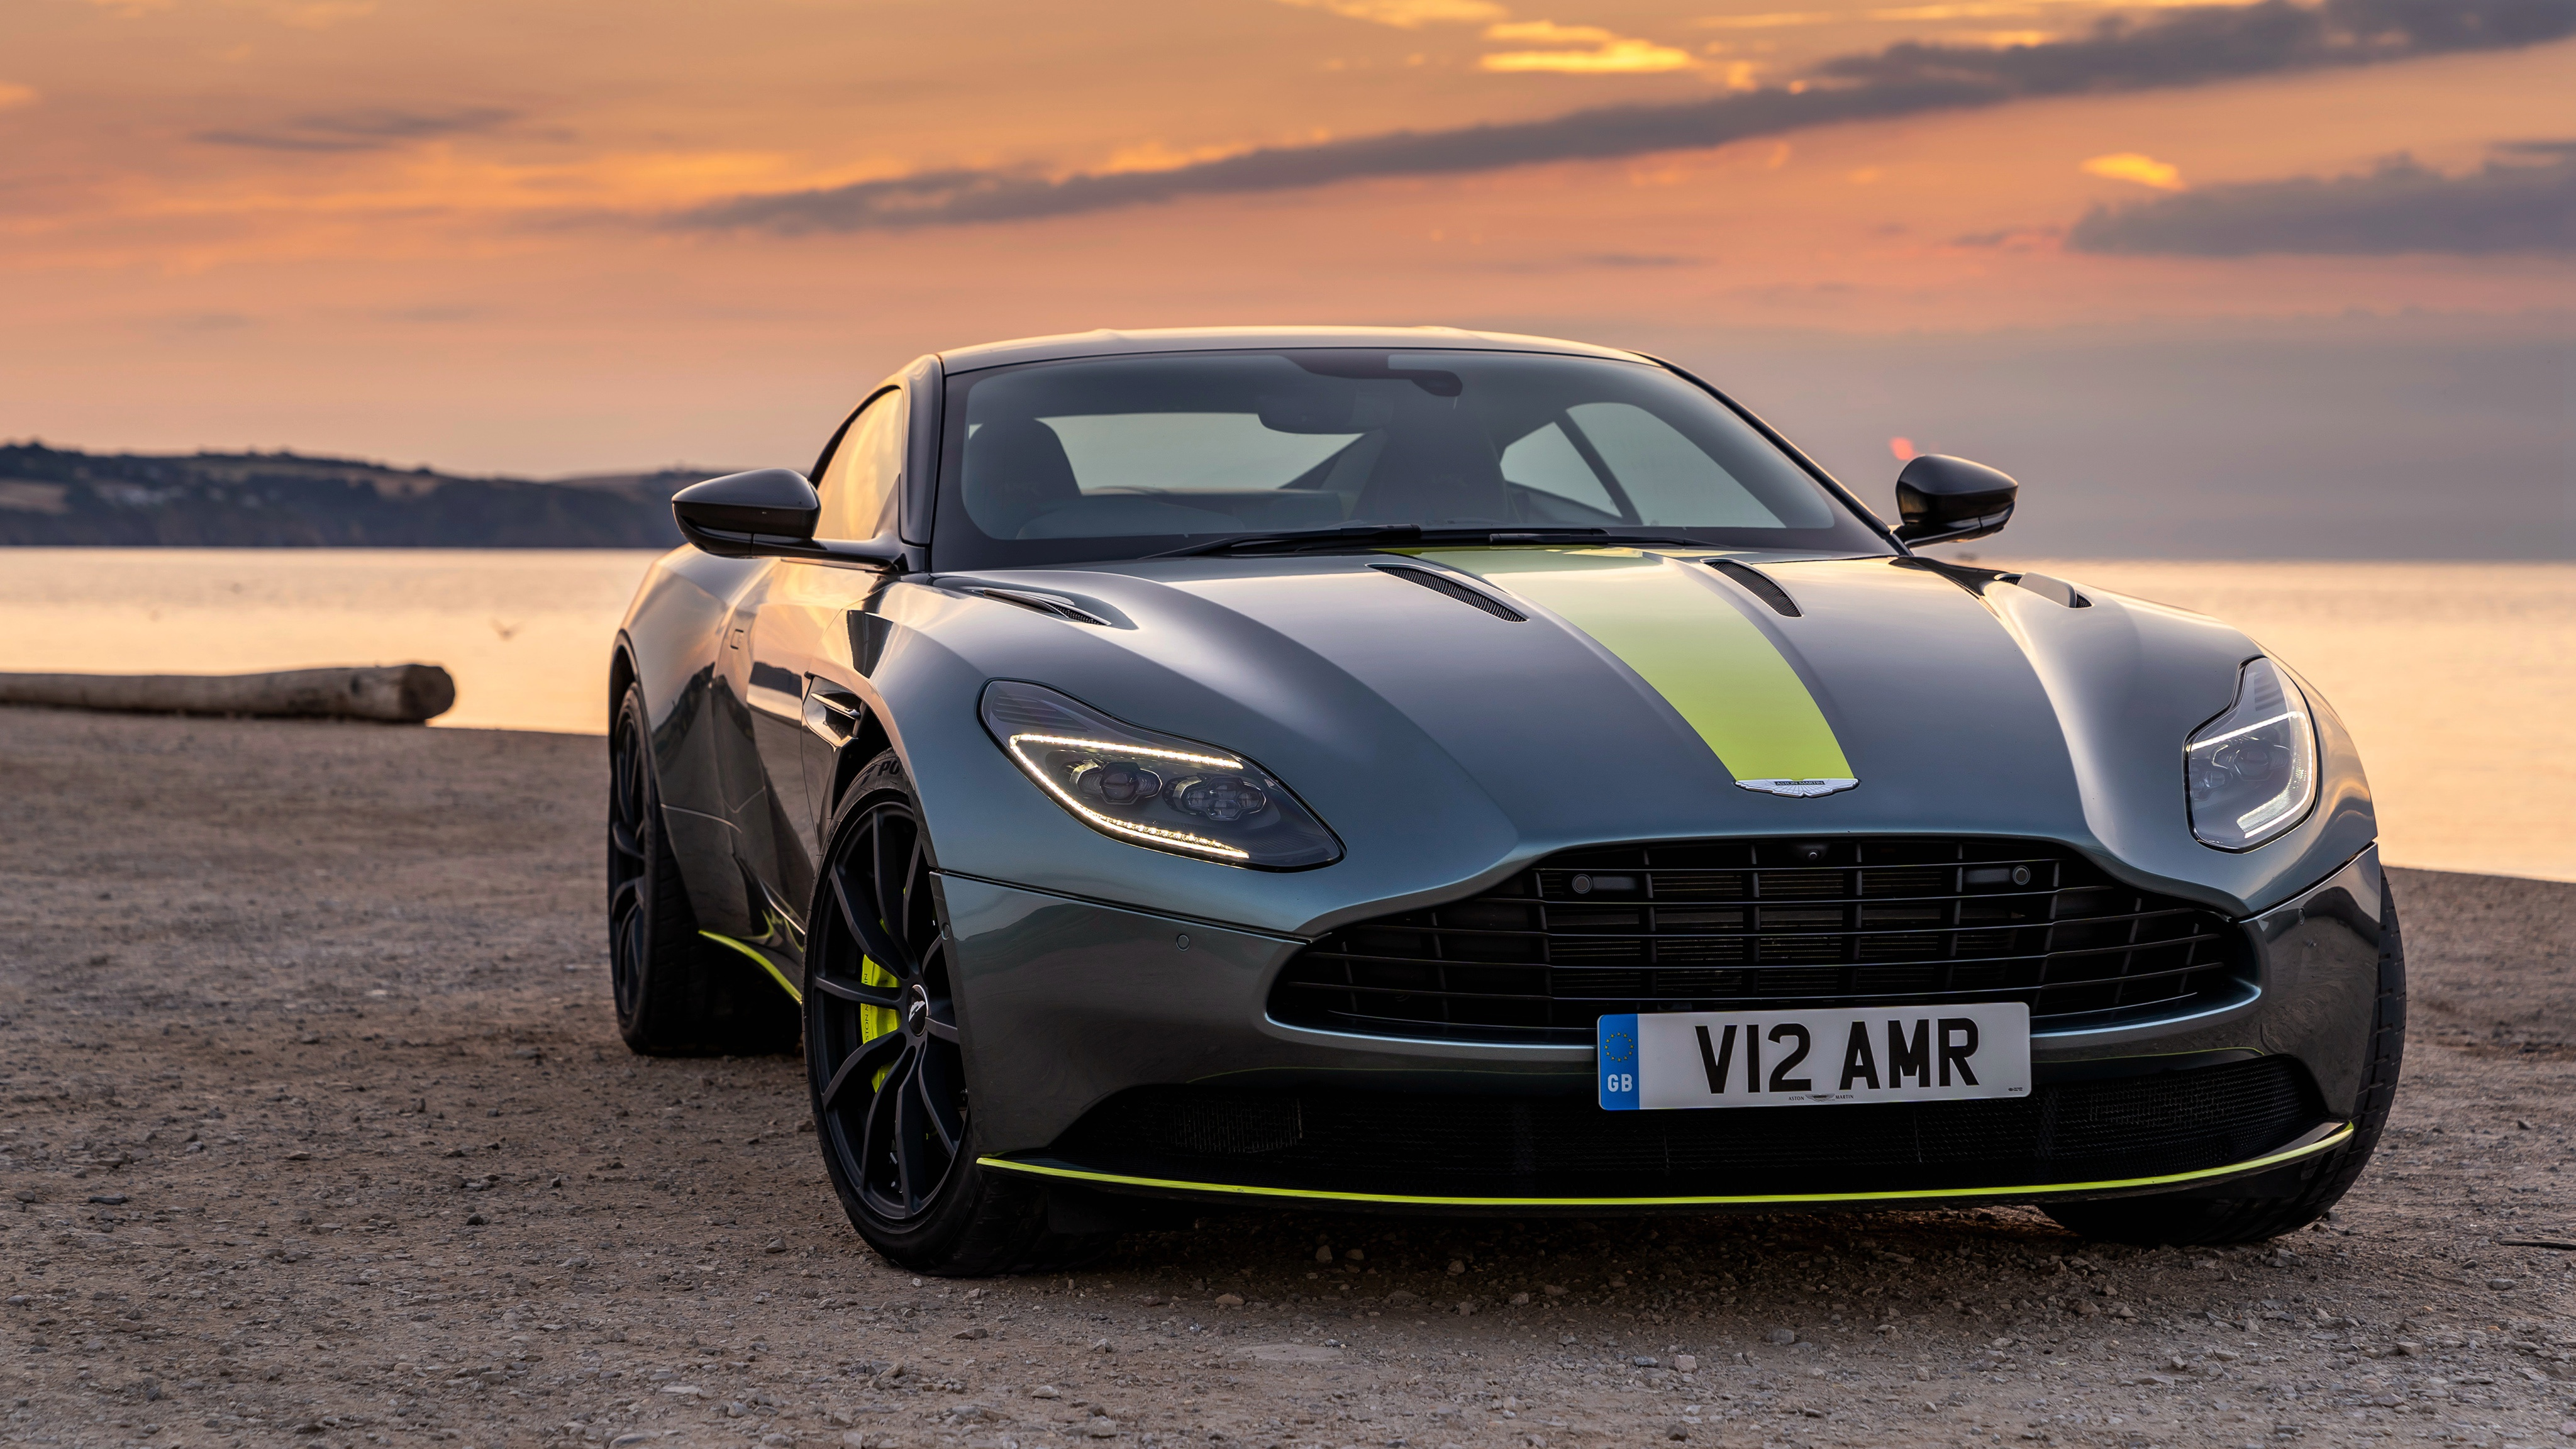 Aston Martin Db11 4k Ultra Hd Wallpaper Background Image